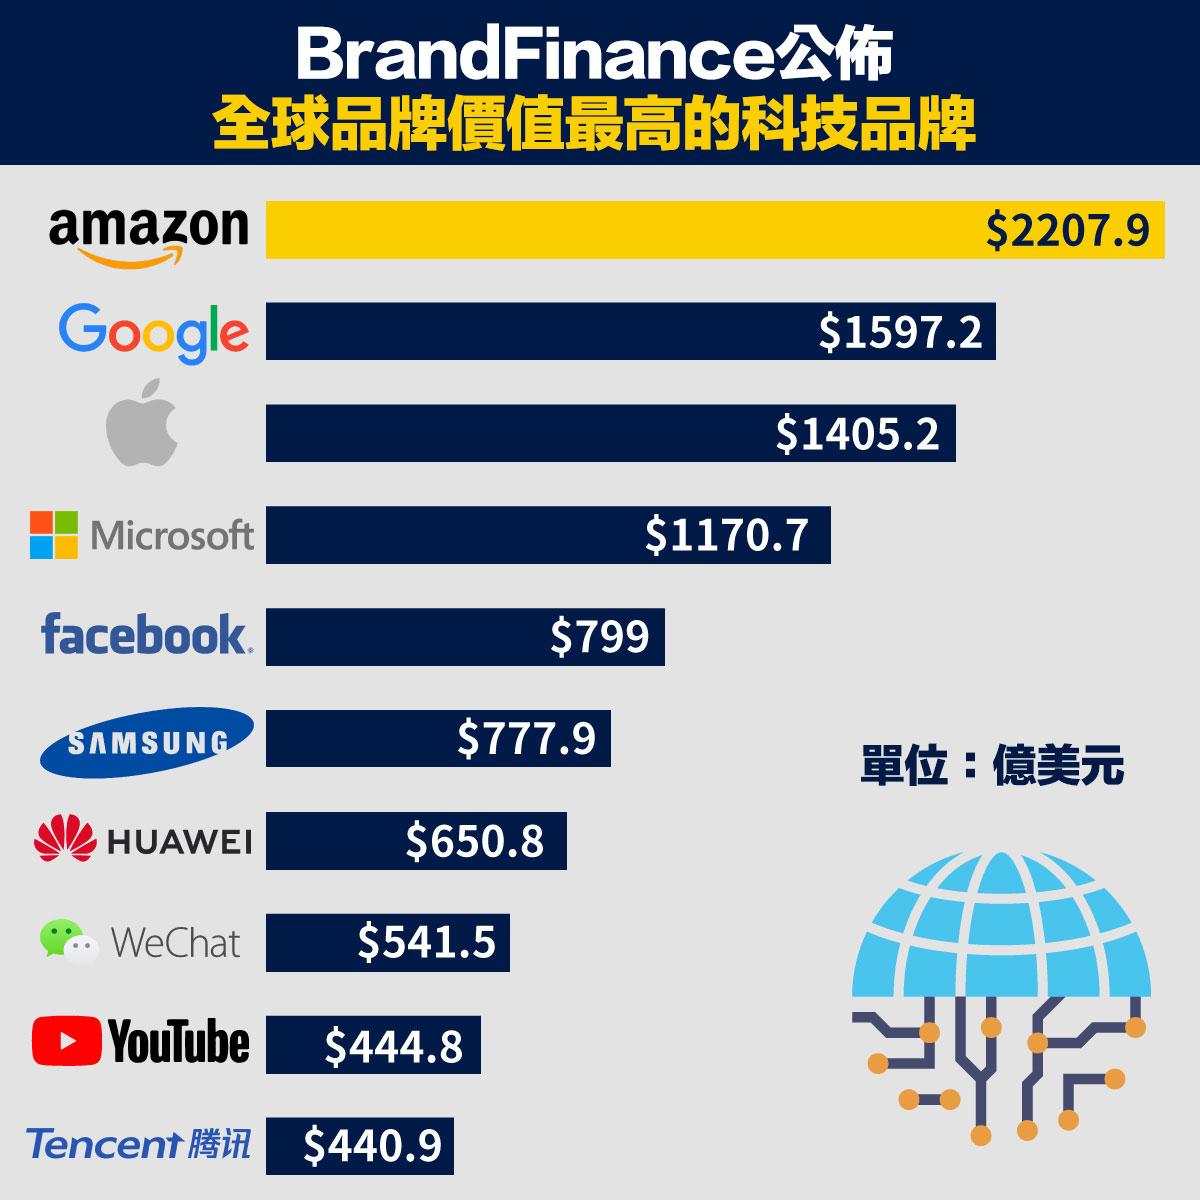 Brand Finance發佈全球最有價值的100大科技品牌榜單,其中,amazon以品牌總價值約2208億美元(約1.7萬億港元)蟬聯第一